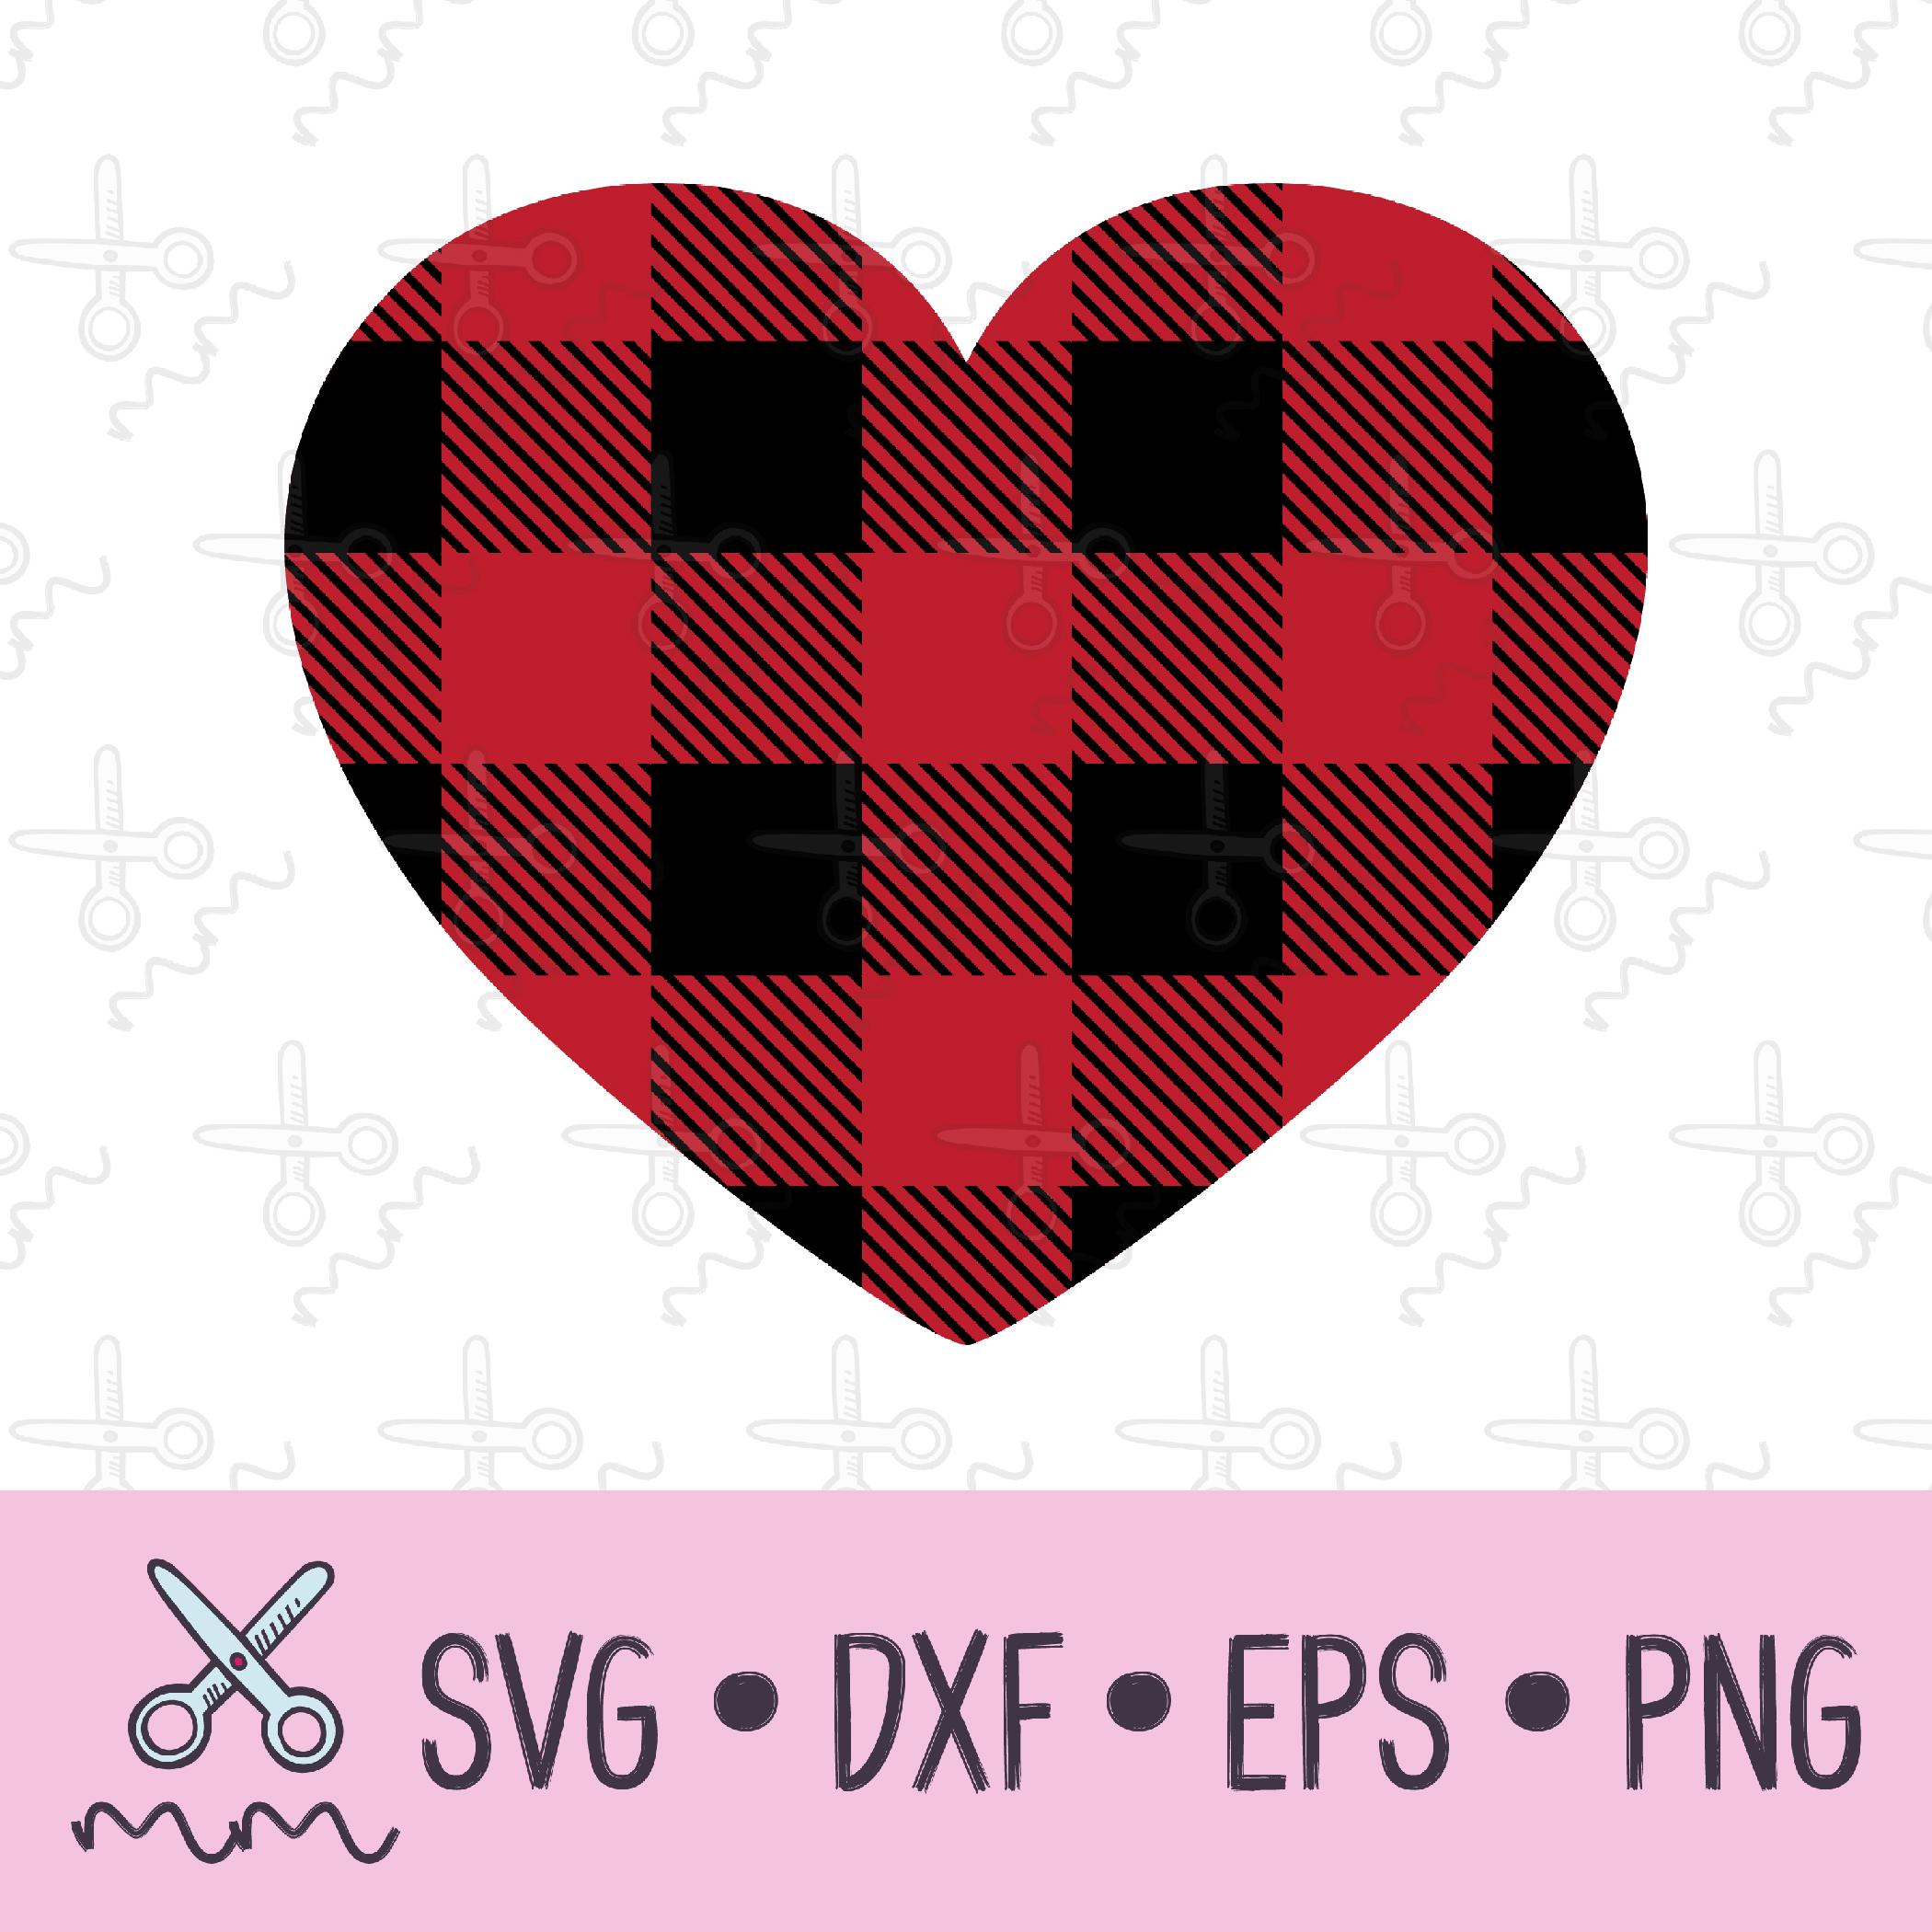 Download Plaid Heart SVG - The Modish Maker